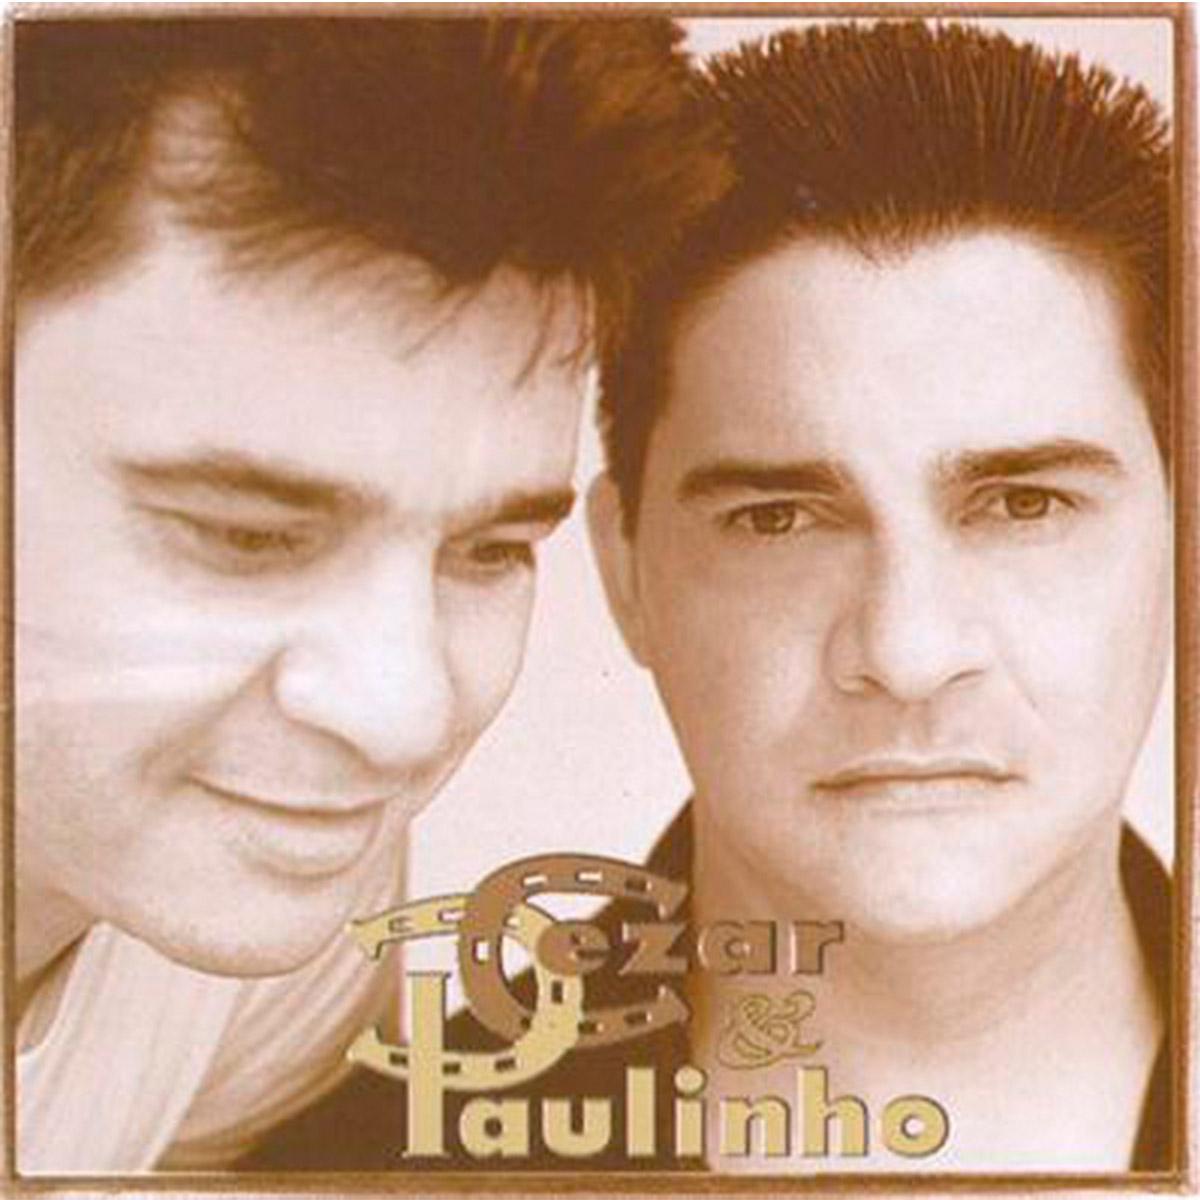 CD Cezar & Paulinho N�is � Cauboi, N�is � Xiki no �rtimo